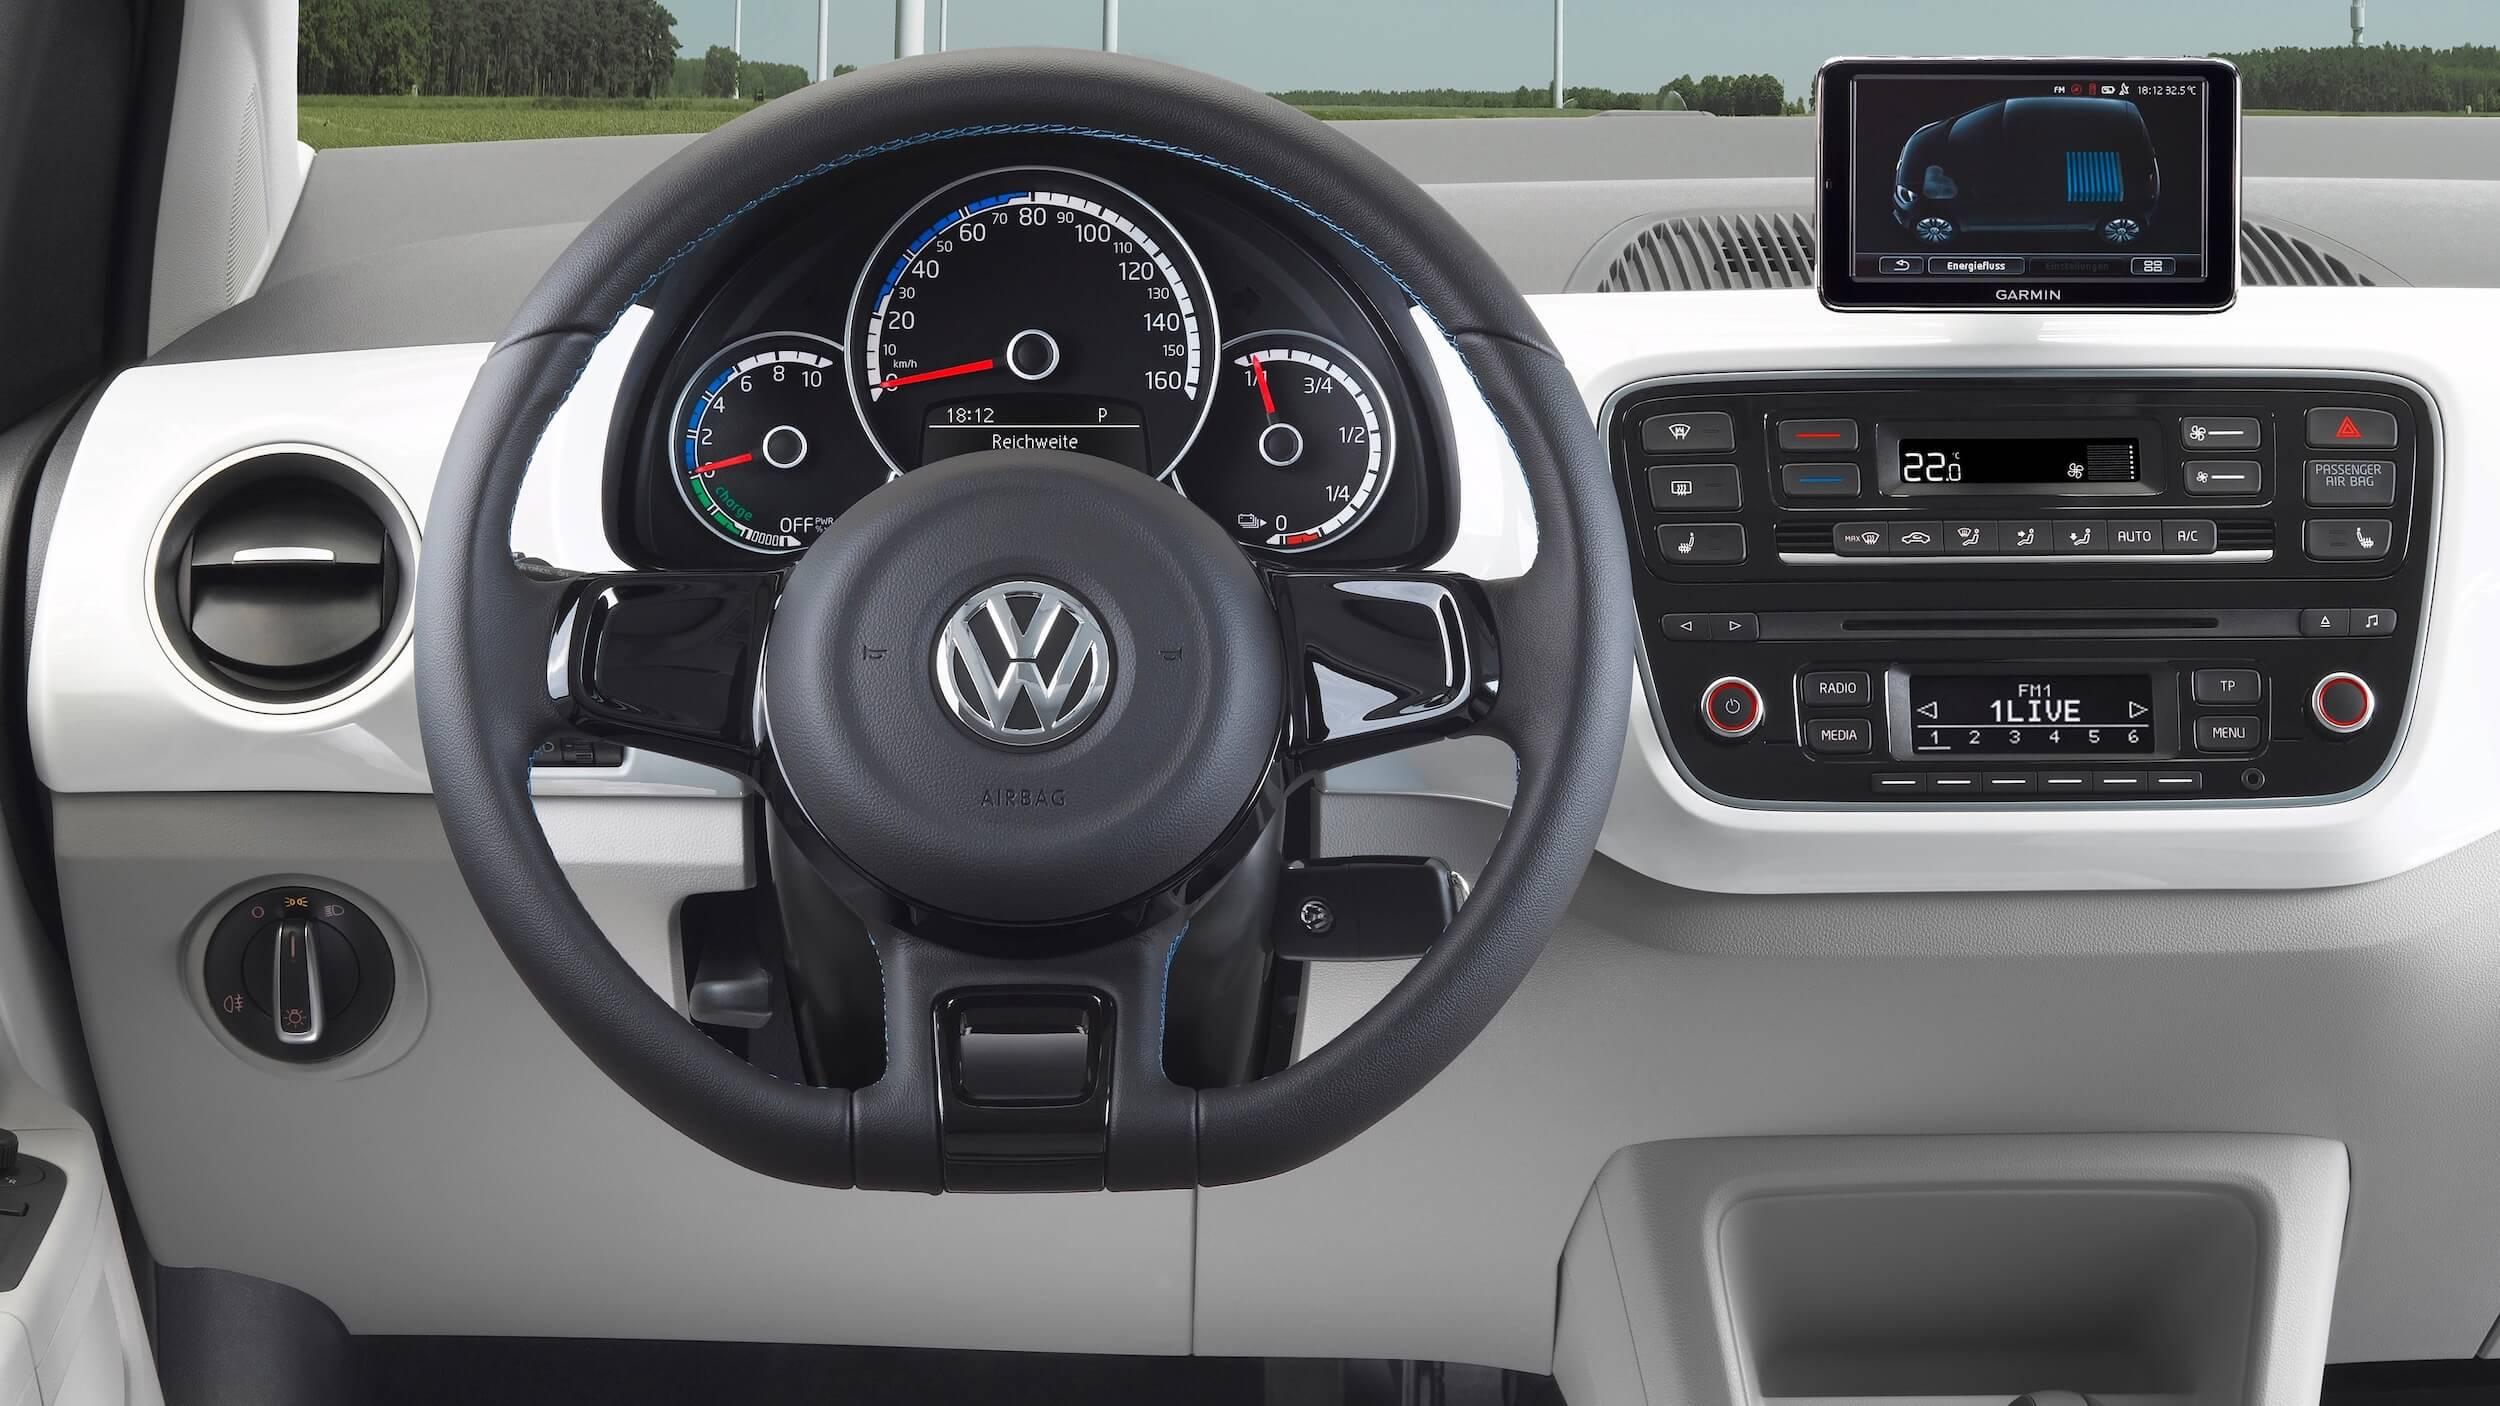 VW e-Up dashboard